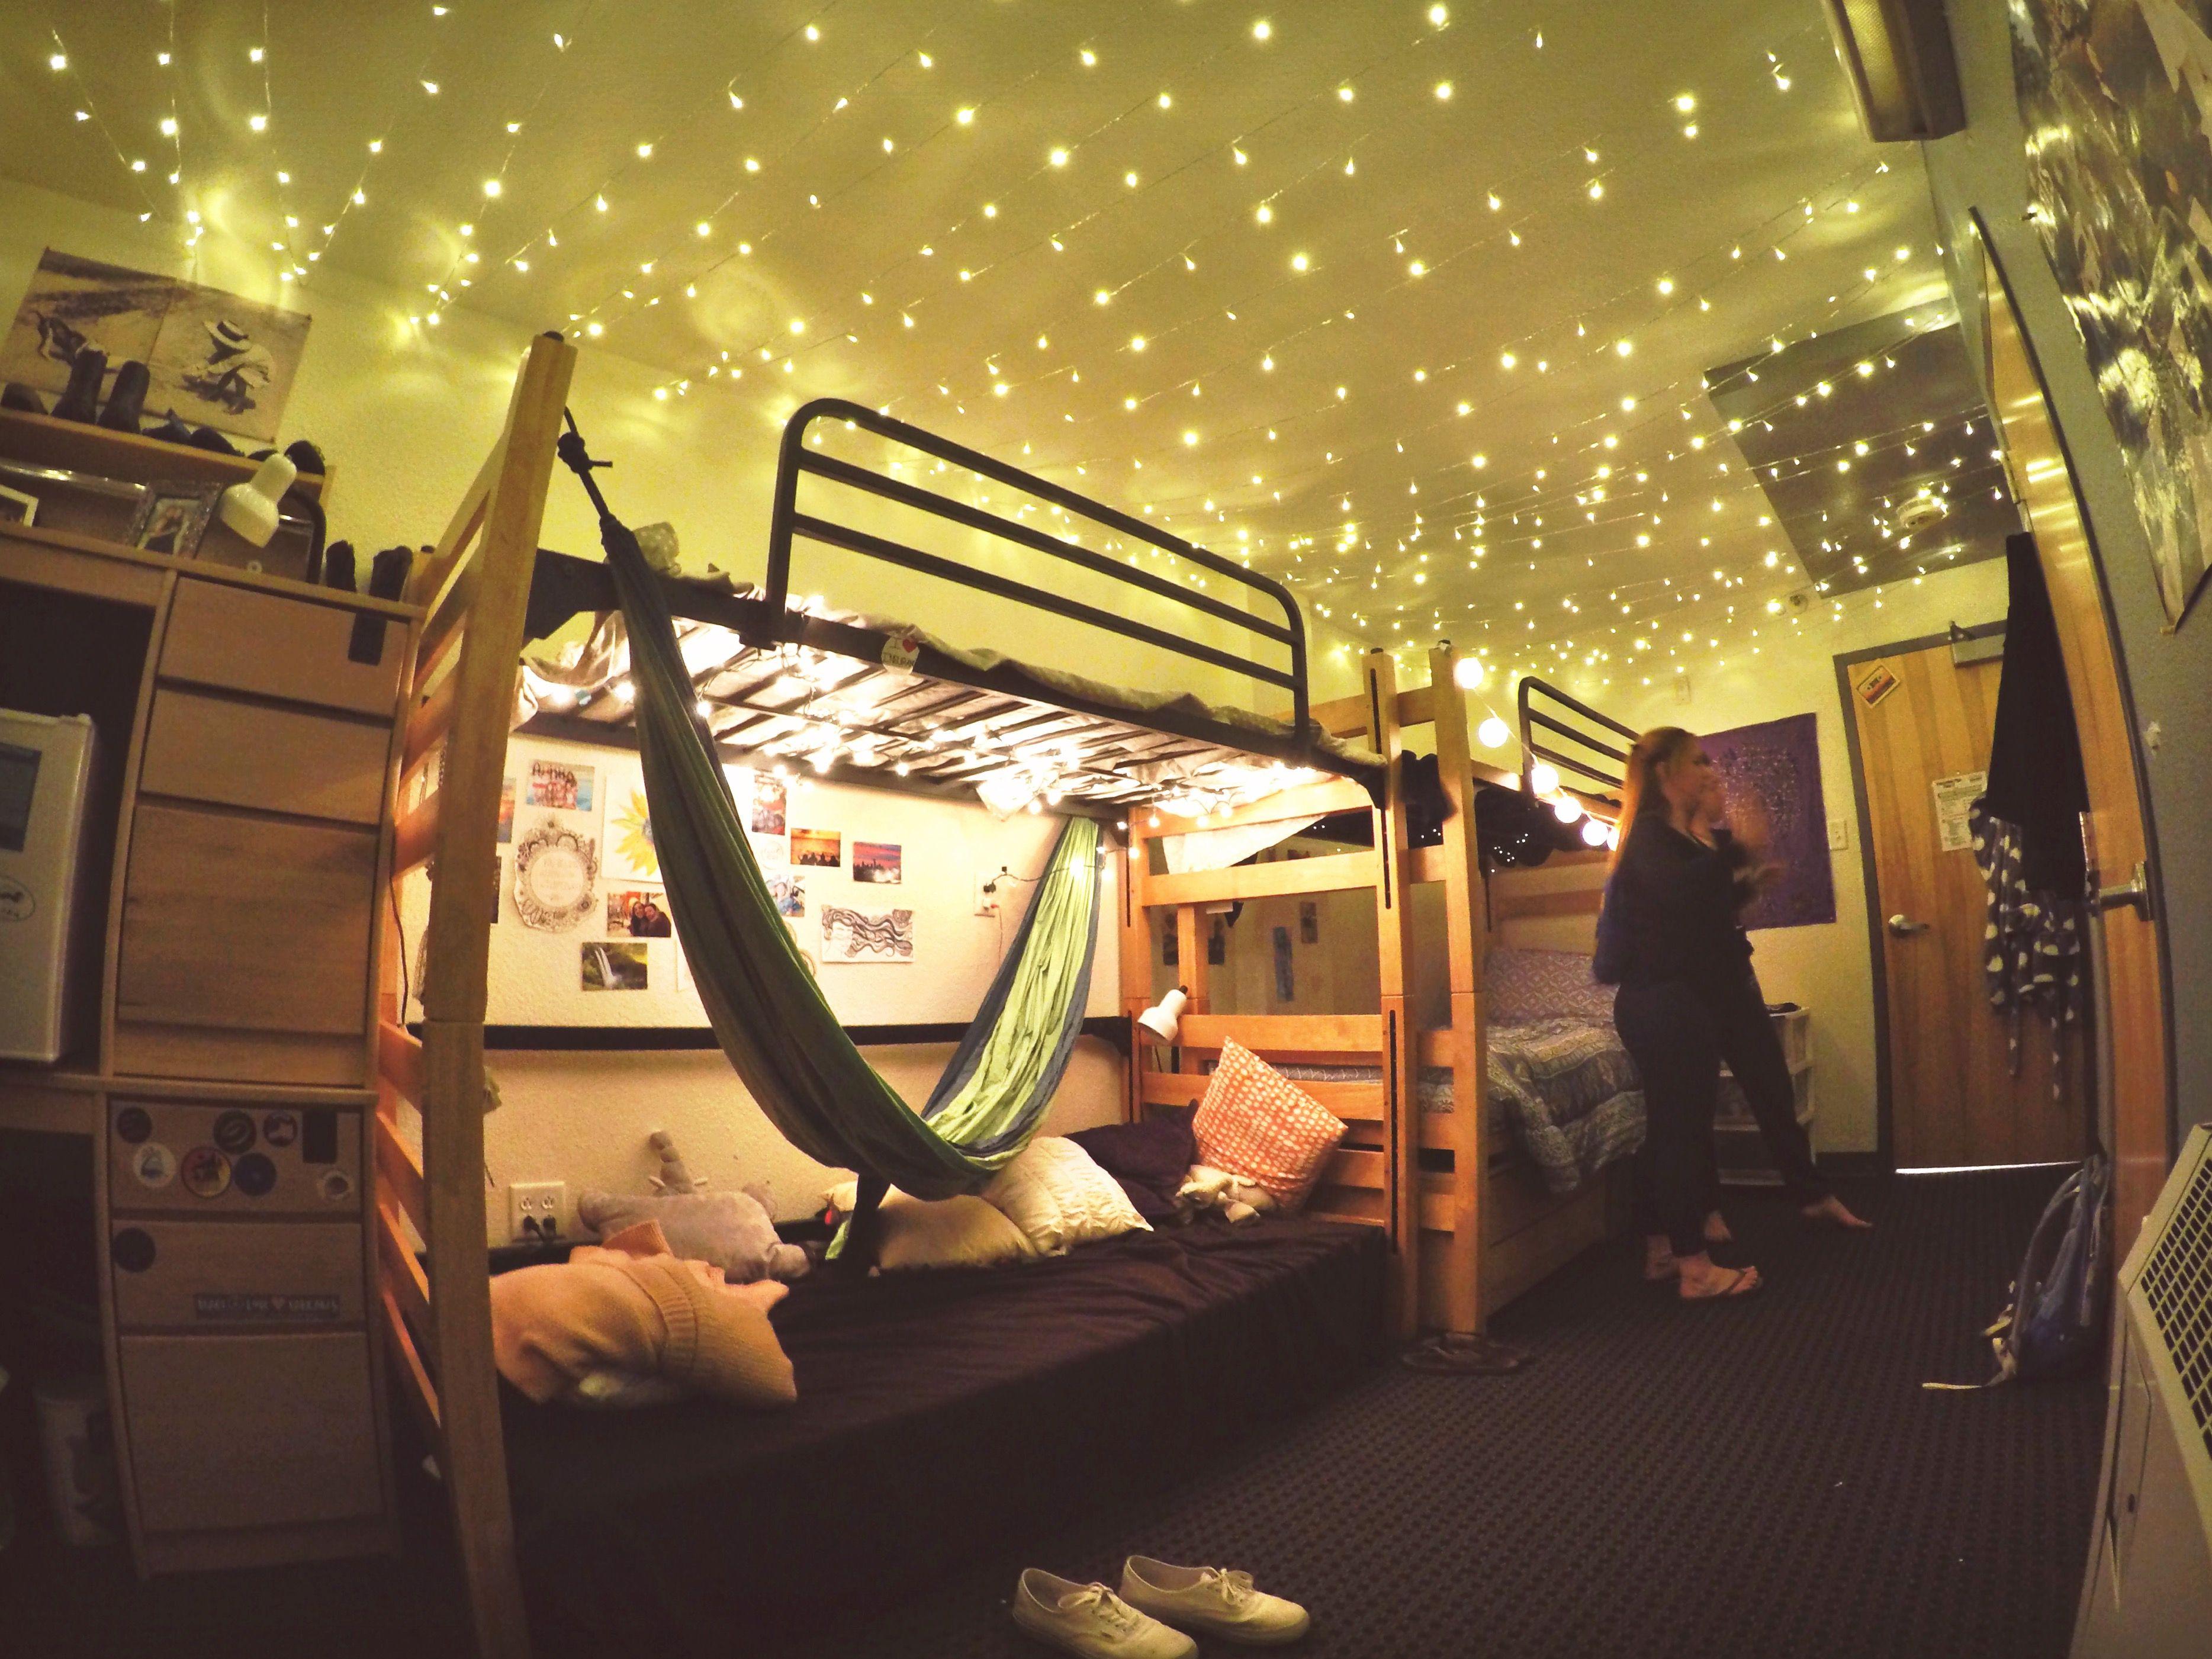 Dorm decor lights - Dorm Decor Lights 21